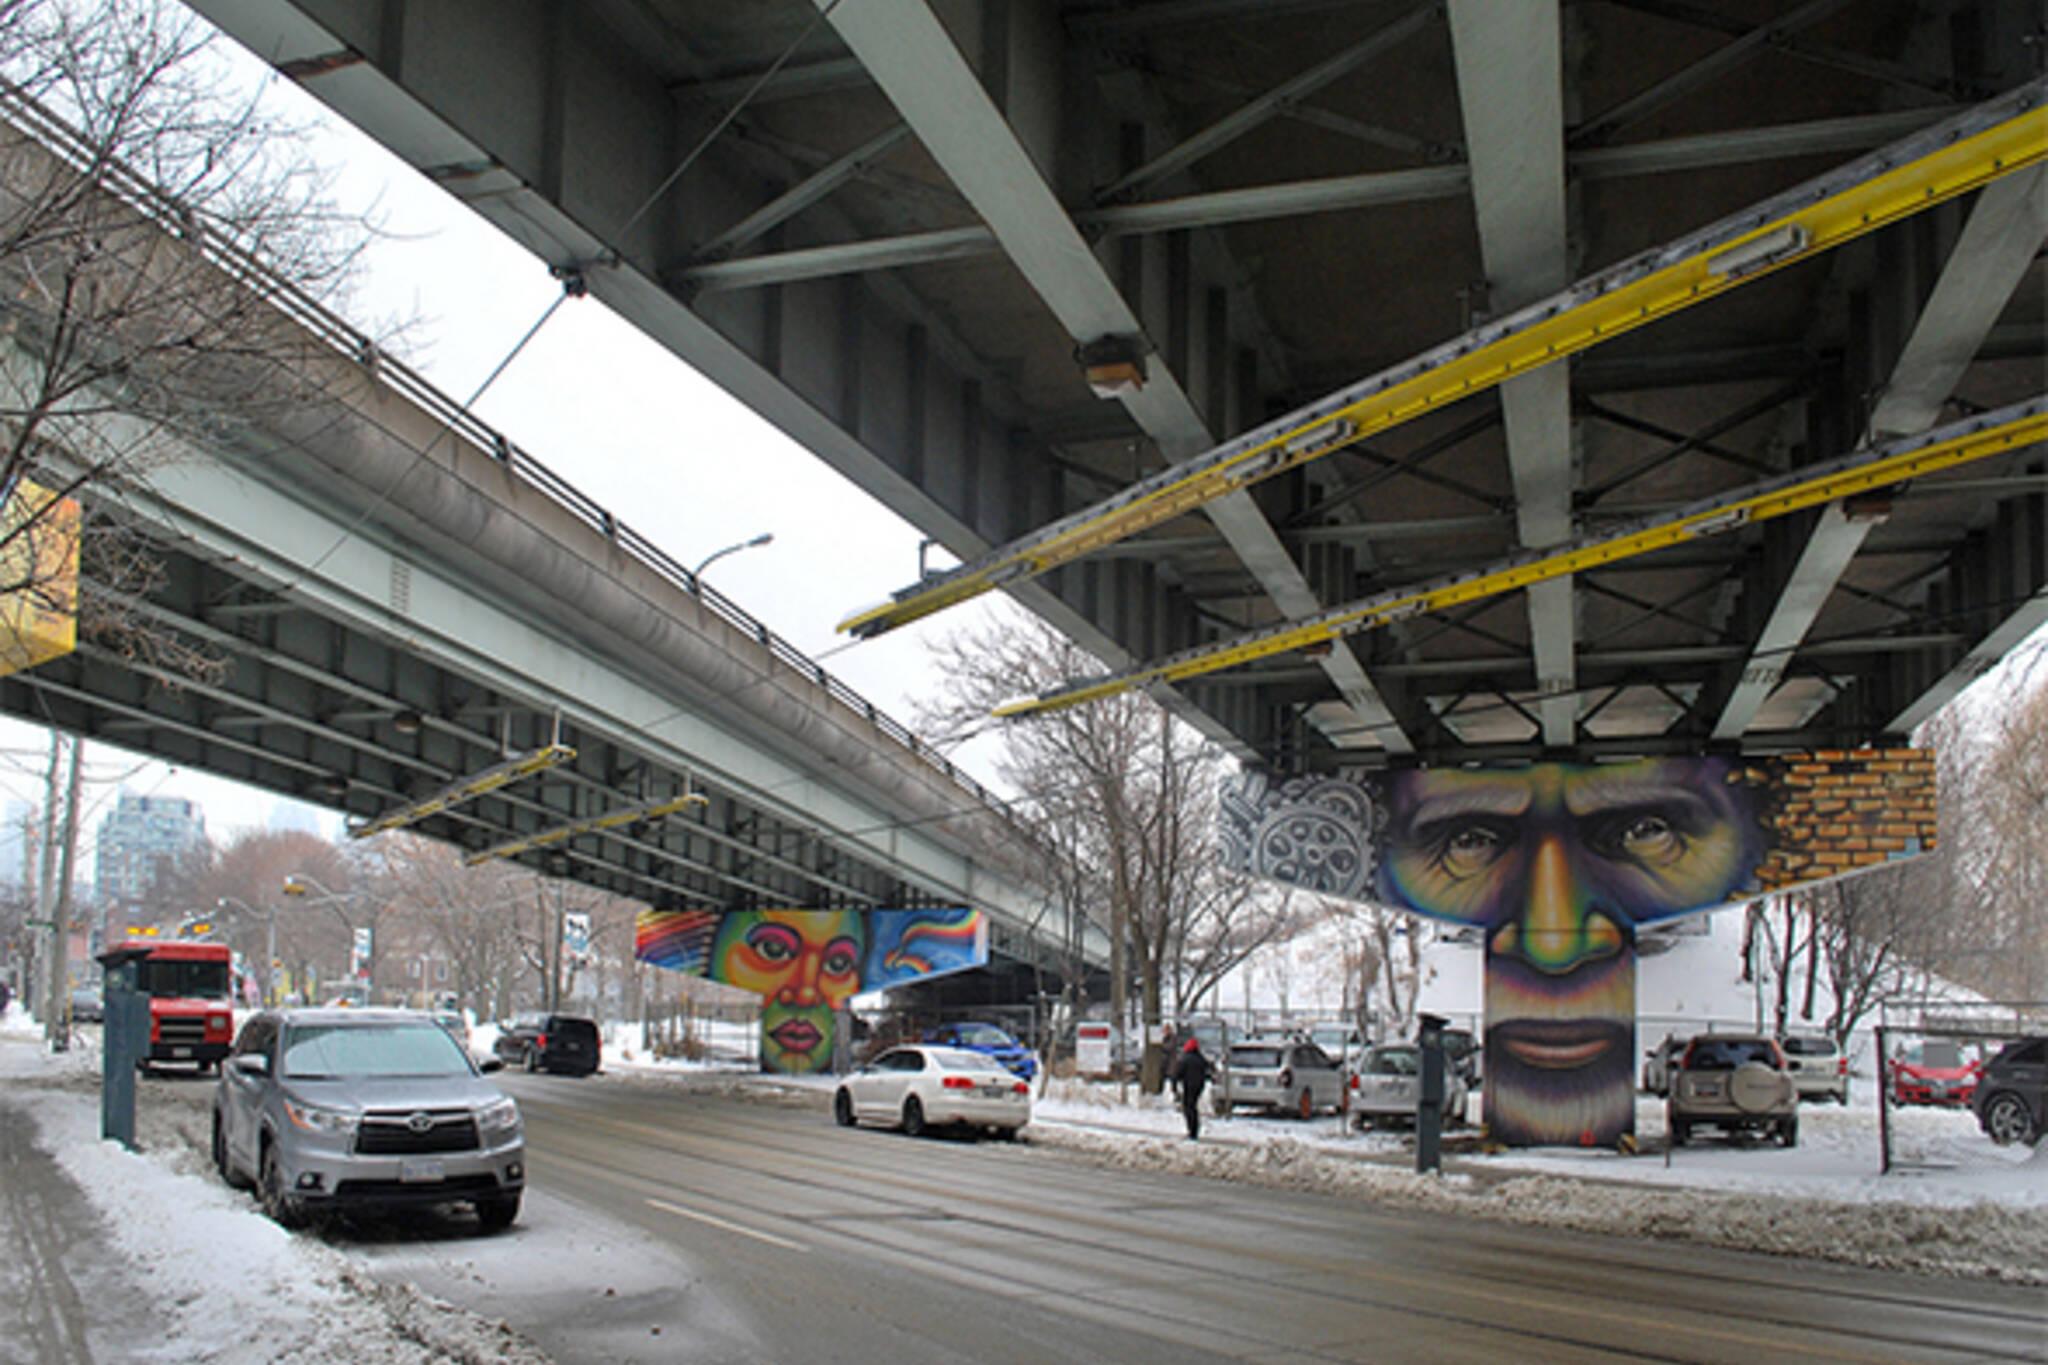 corktown murals